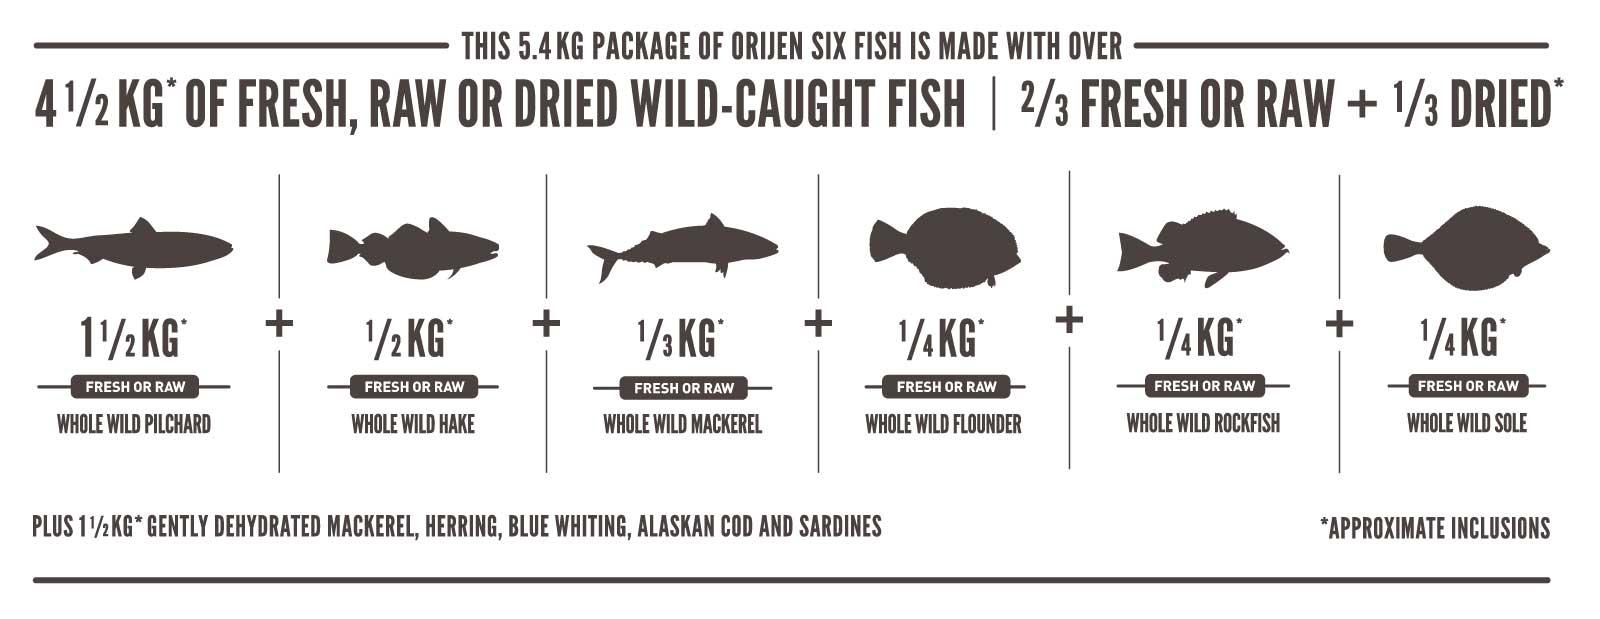 Ingredientes Orijen Gato Six Fish